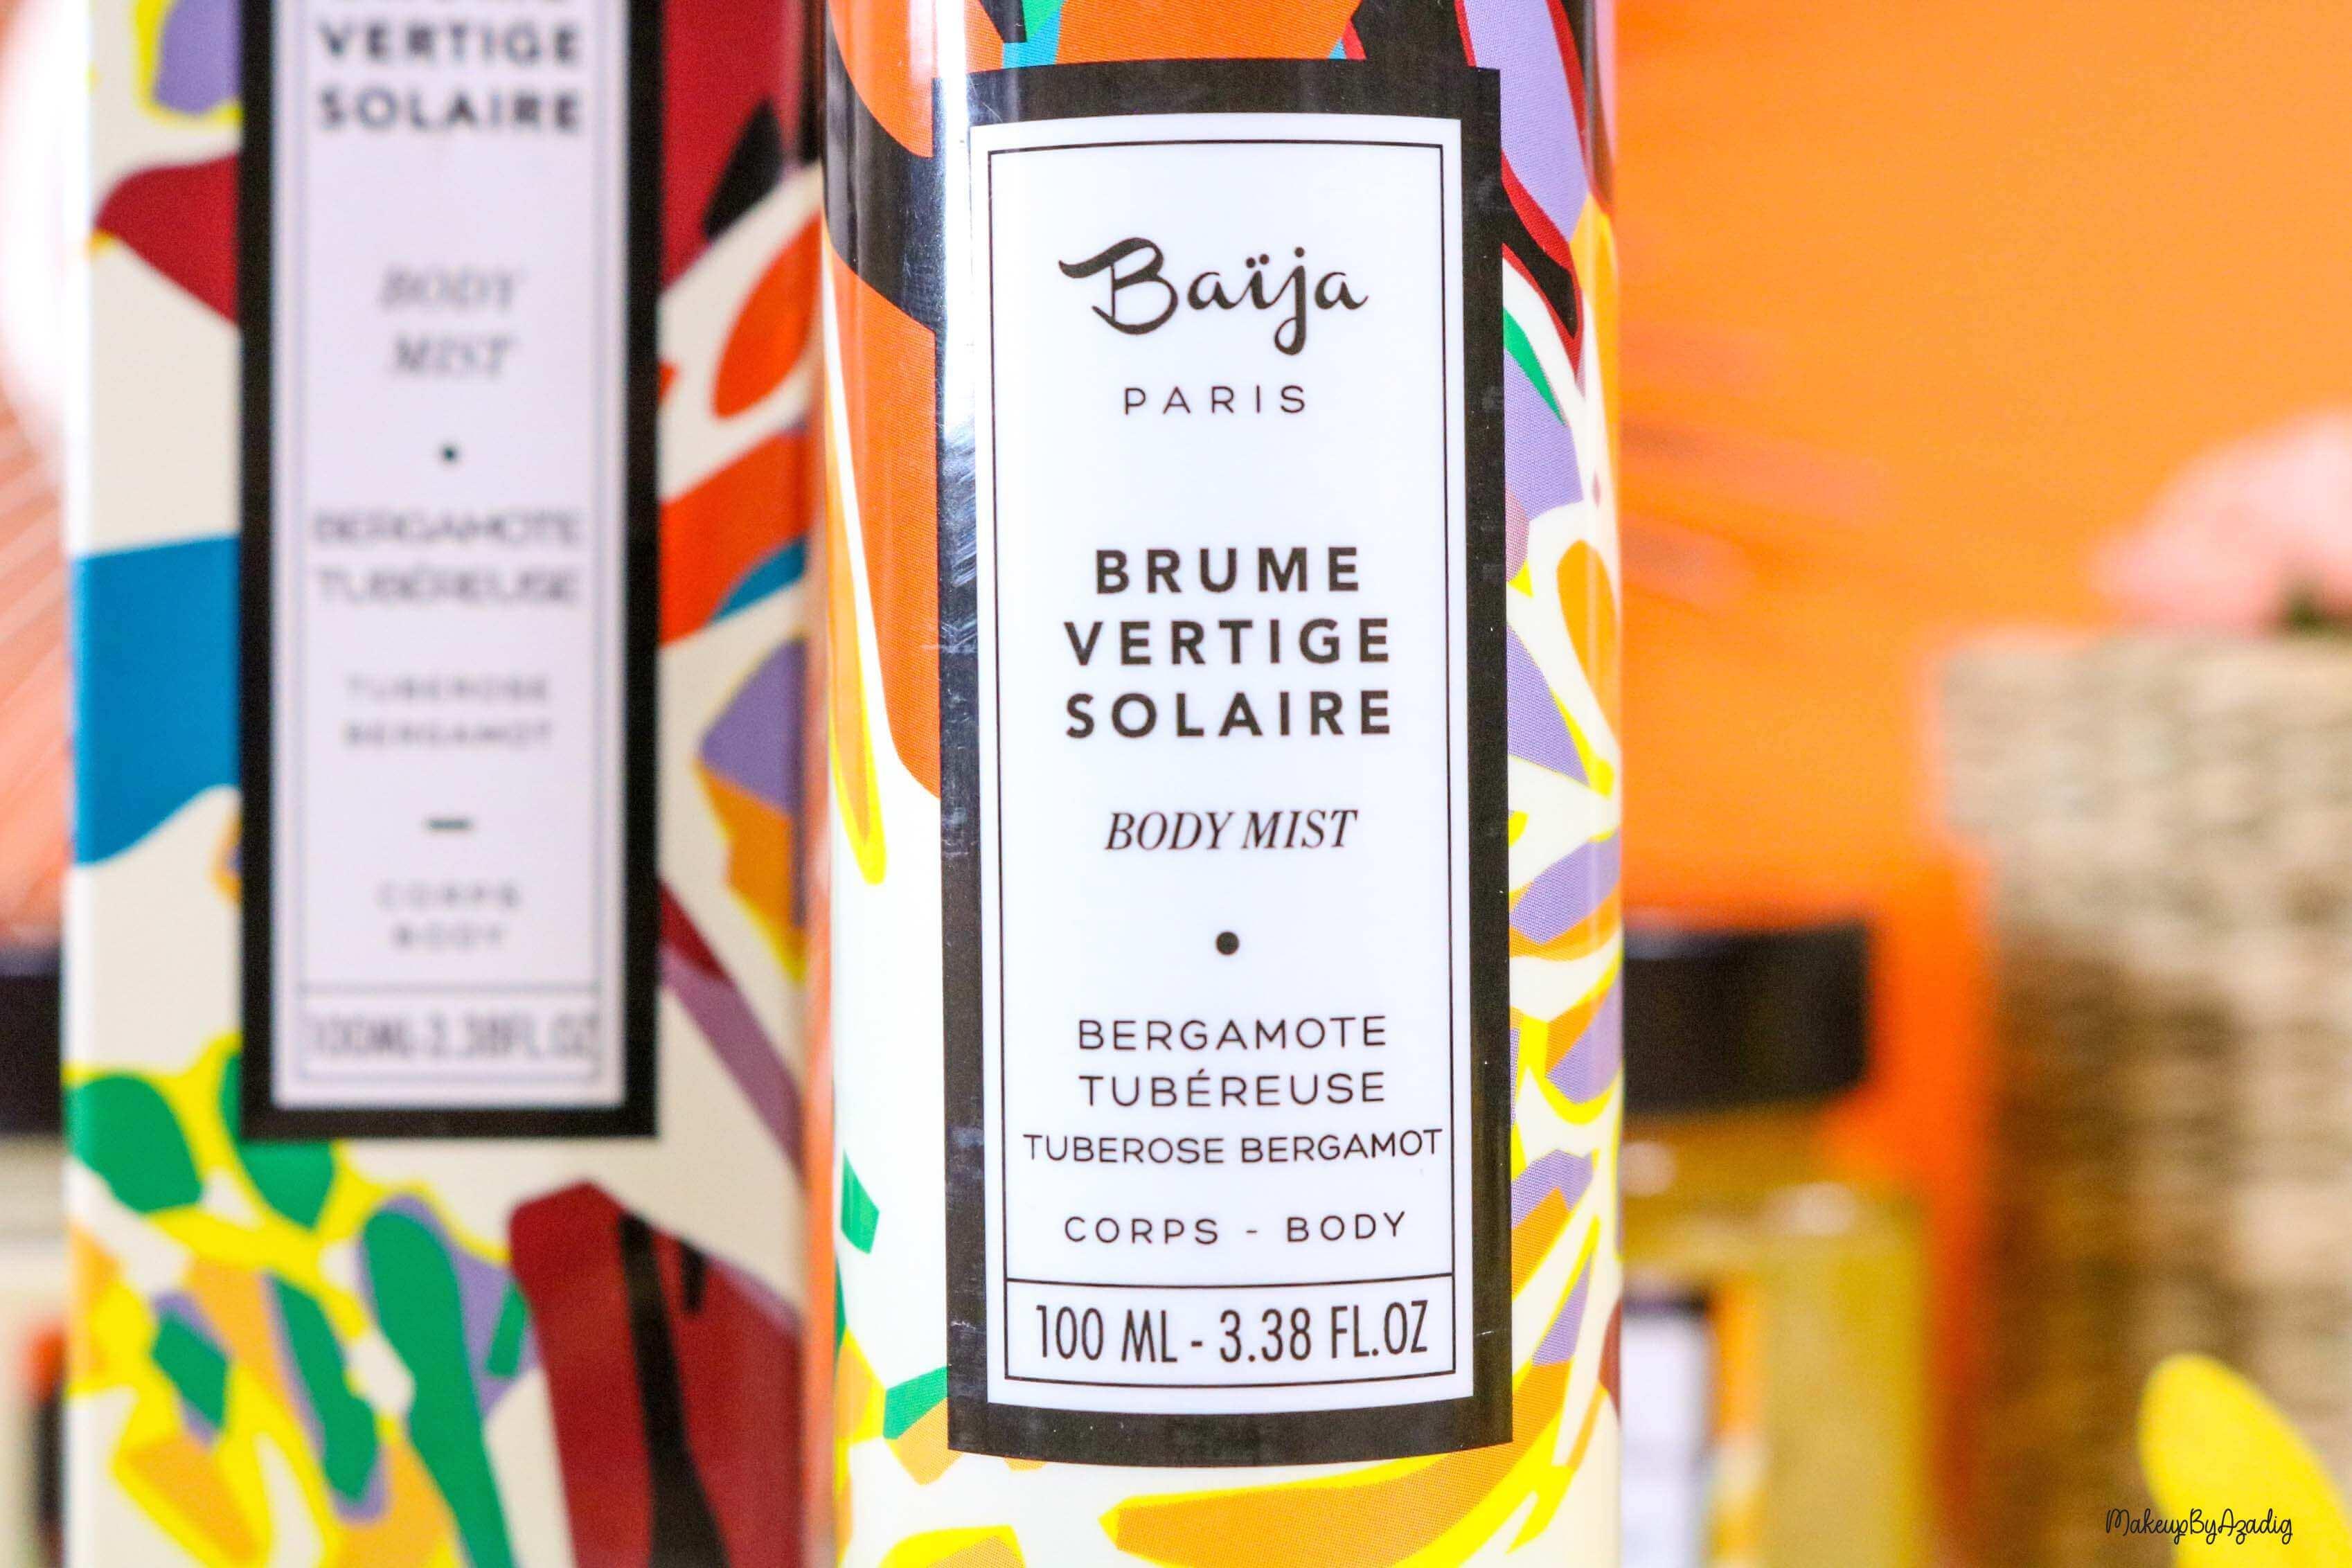 nouveaute-soin-baija-vertige-solaire-sephora-promo-code-gommage-creme-corps-brume-avis-prix-makeupbyazadig-qualite-commande